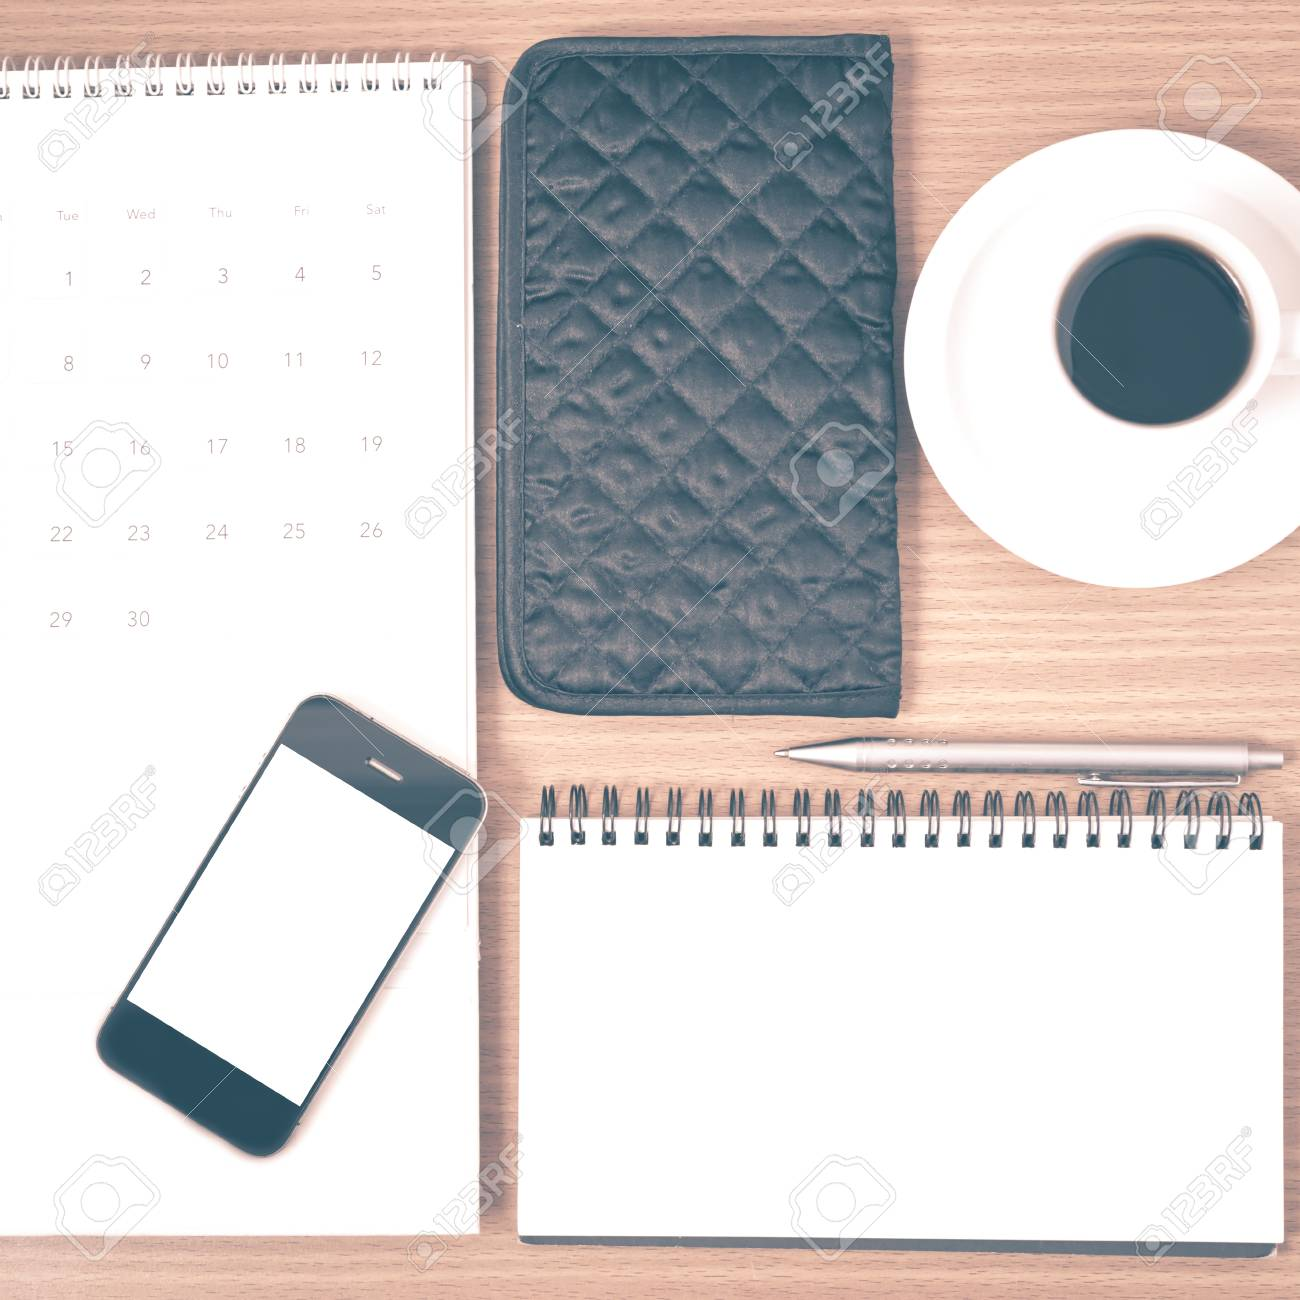 Calendario Con Note.Desktop Caffe Con Telefono Blocco Note Portafoglio Calendario Su Legno Sfondo Stile Vintage